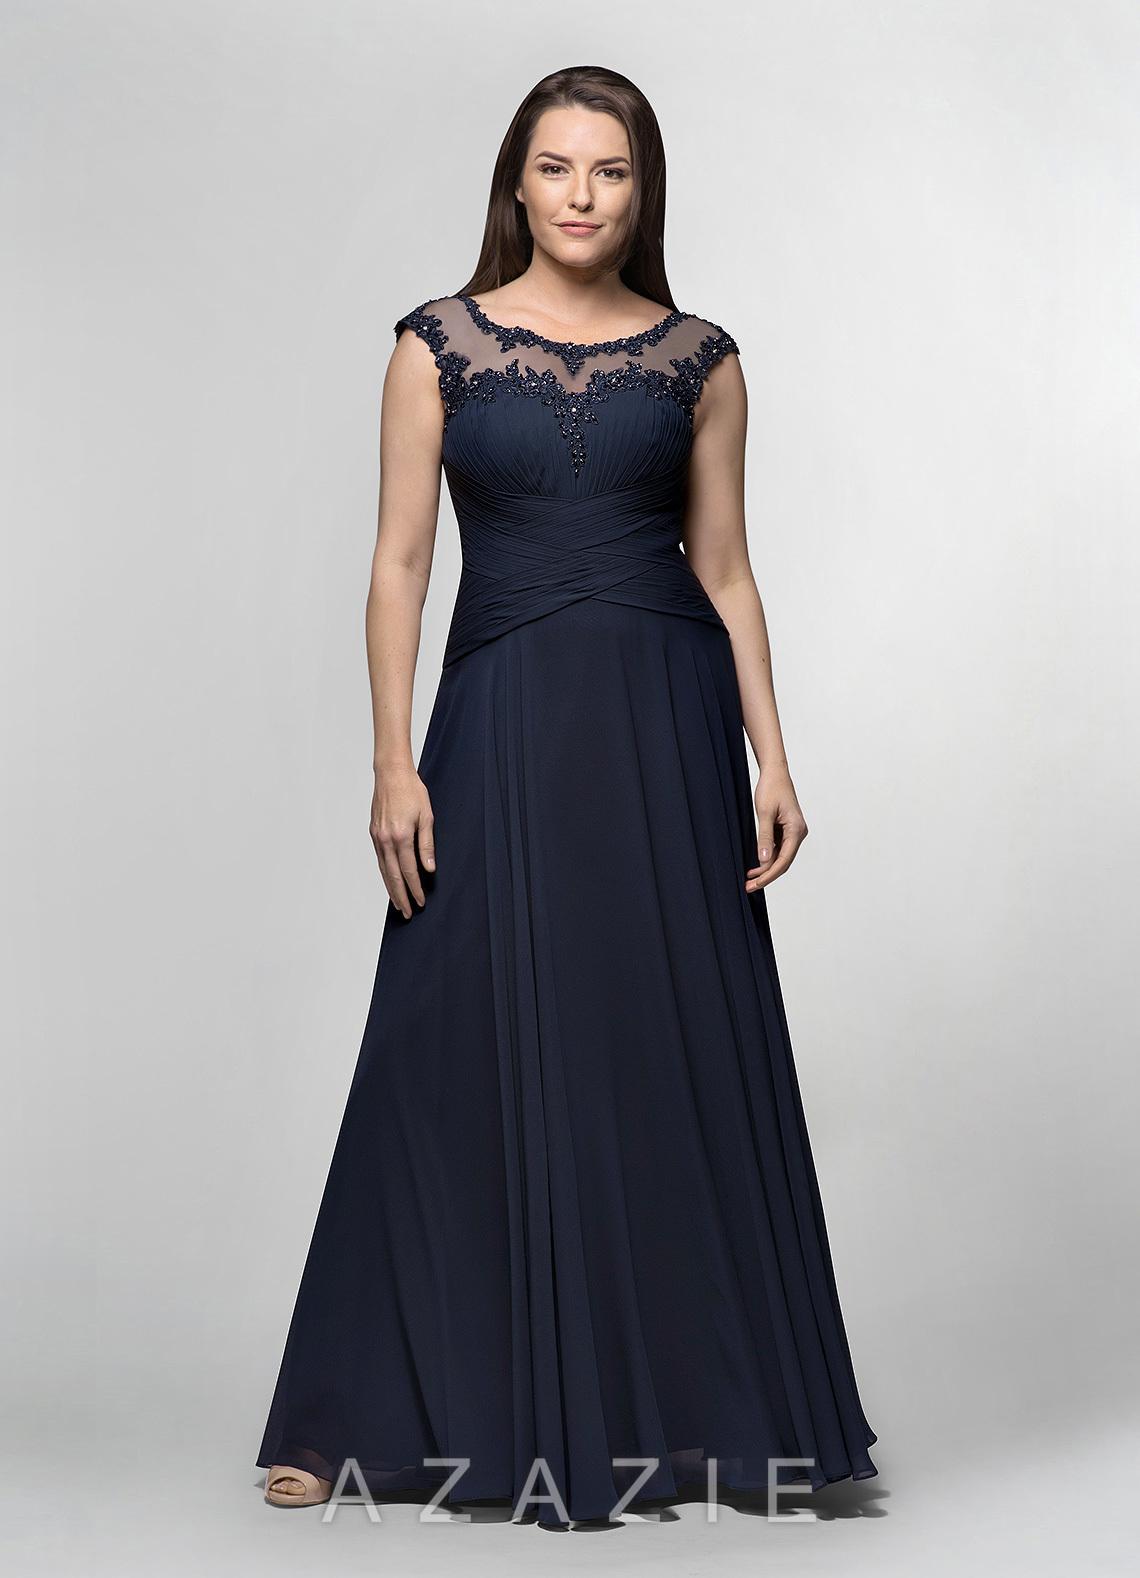 d8c984f4fdec1 Azazie Mina MBD Mother Of The Bride Dress | Azazie